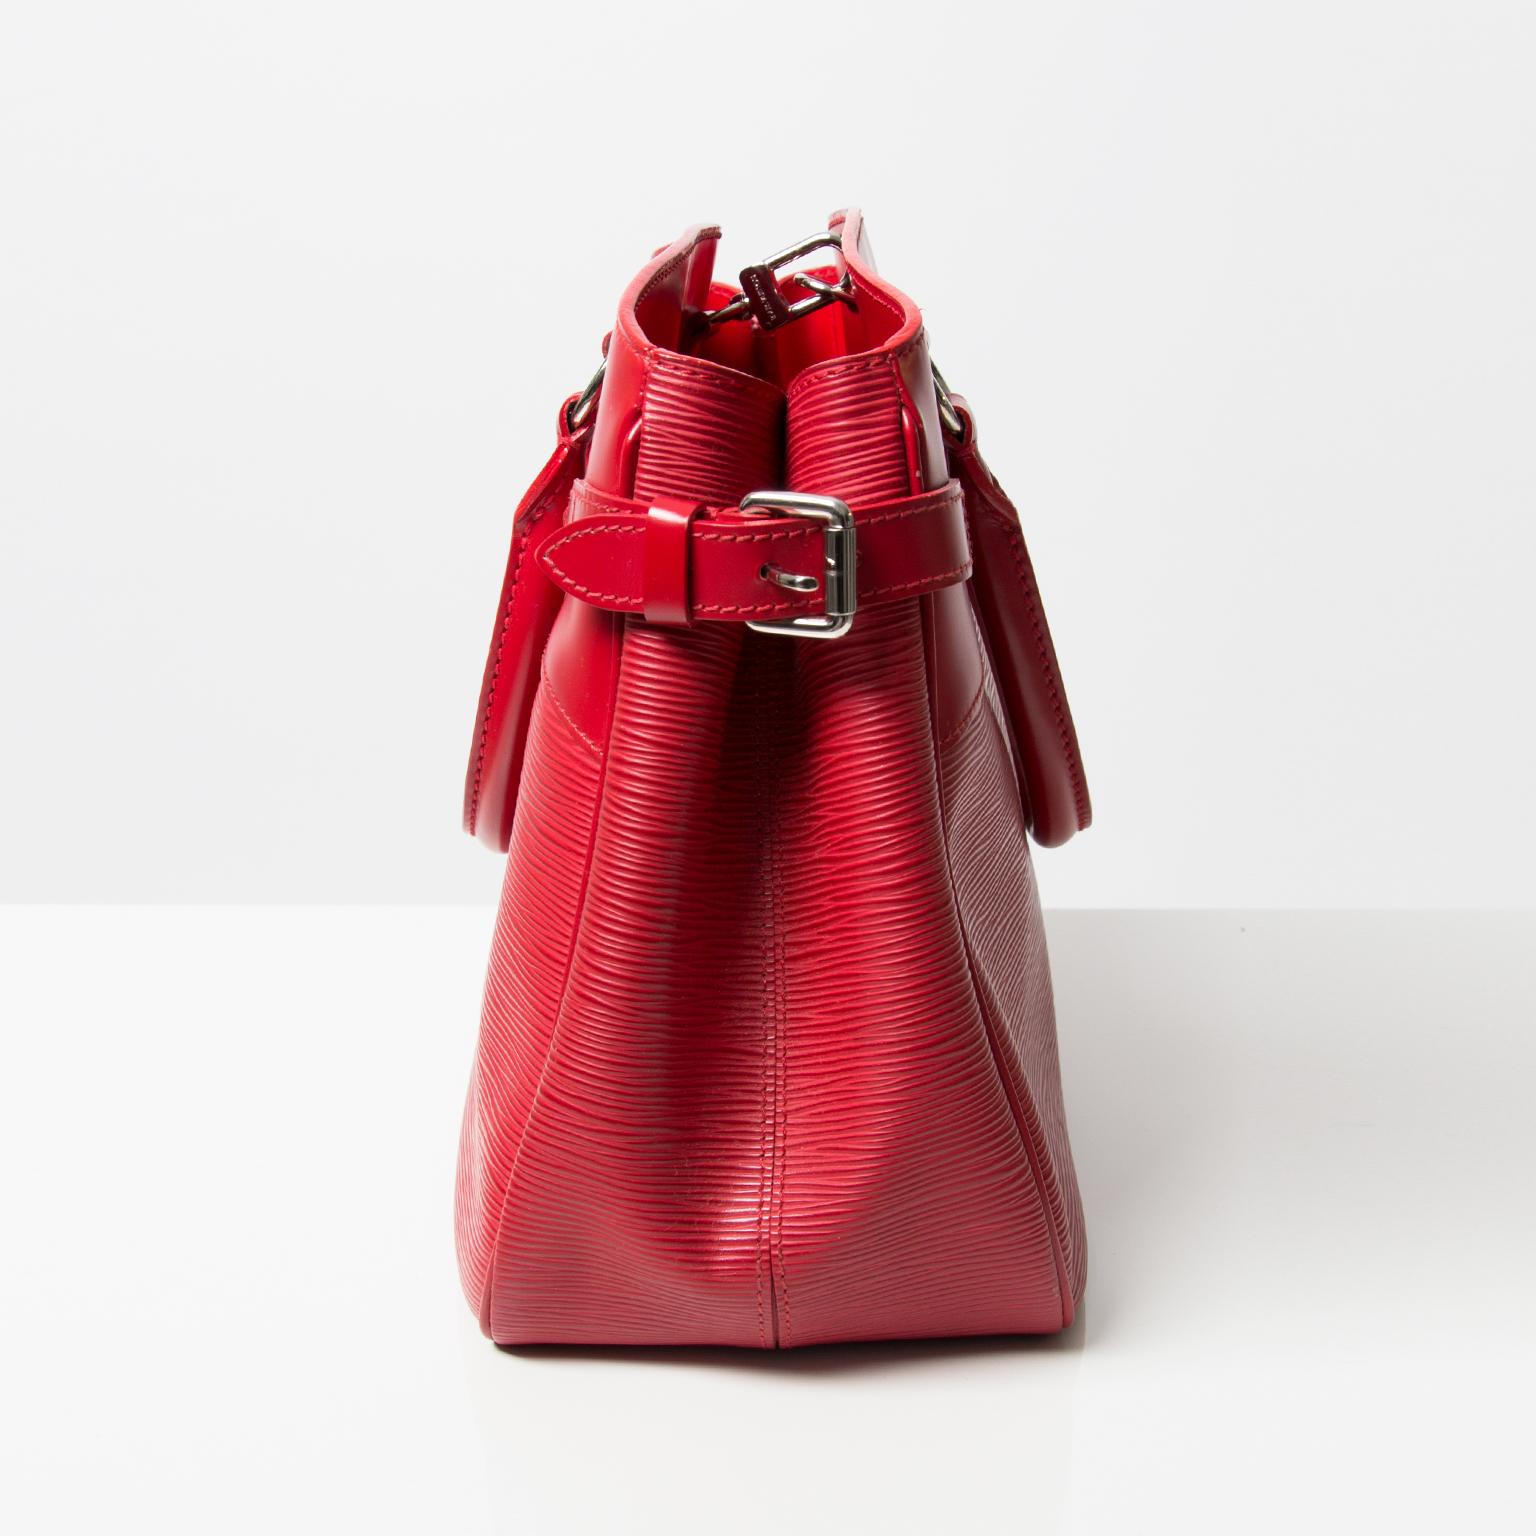 abecb01a75cf ... Tweedehands Louis Vuitton LV Passy tote tas rood leer authentieke luxe  merken designer vintage labellov